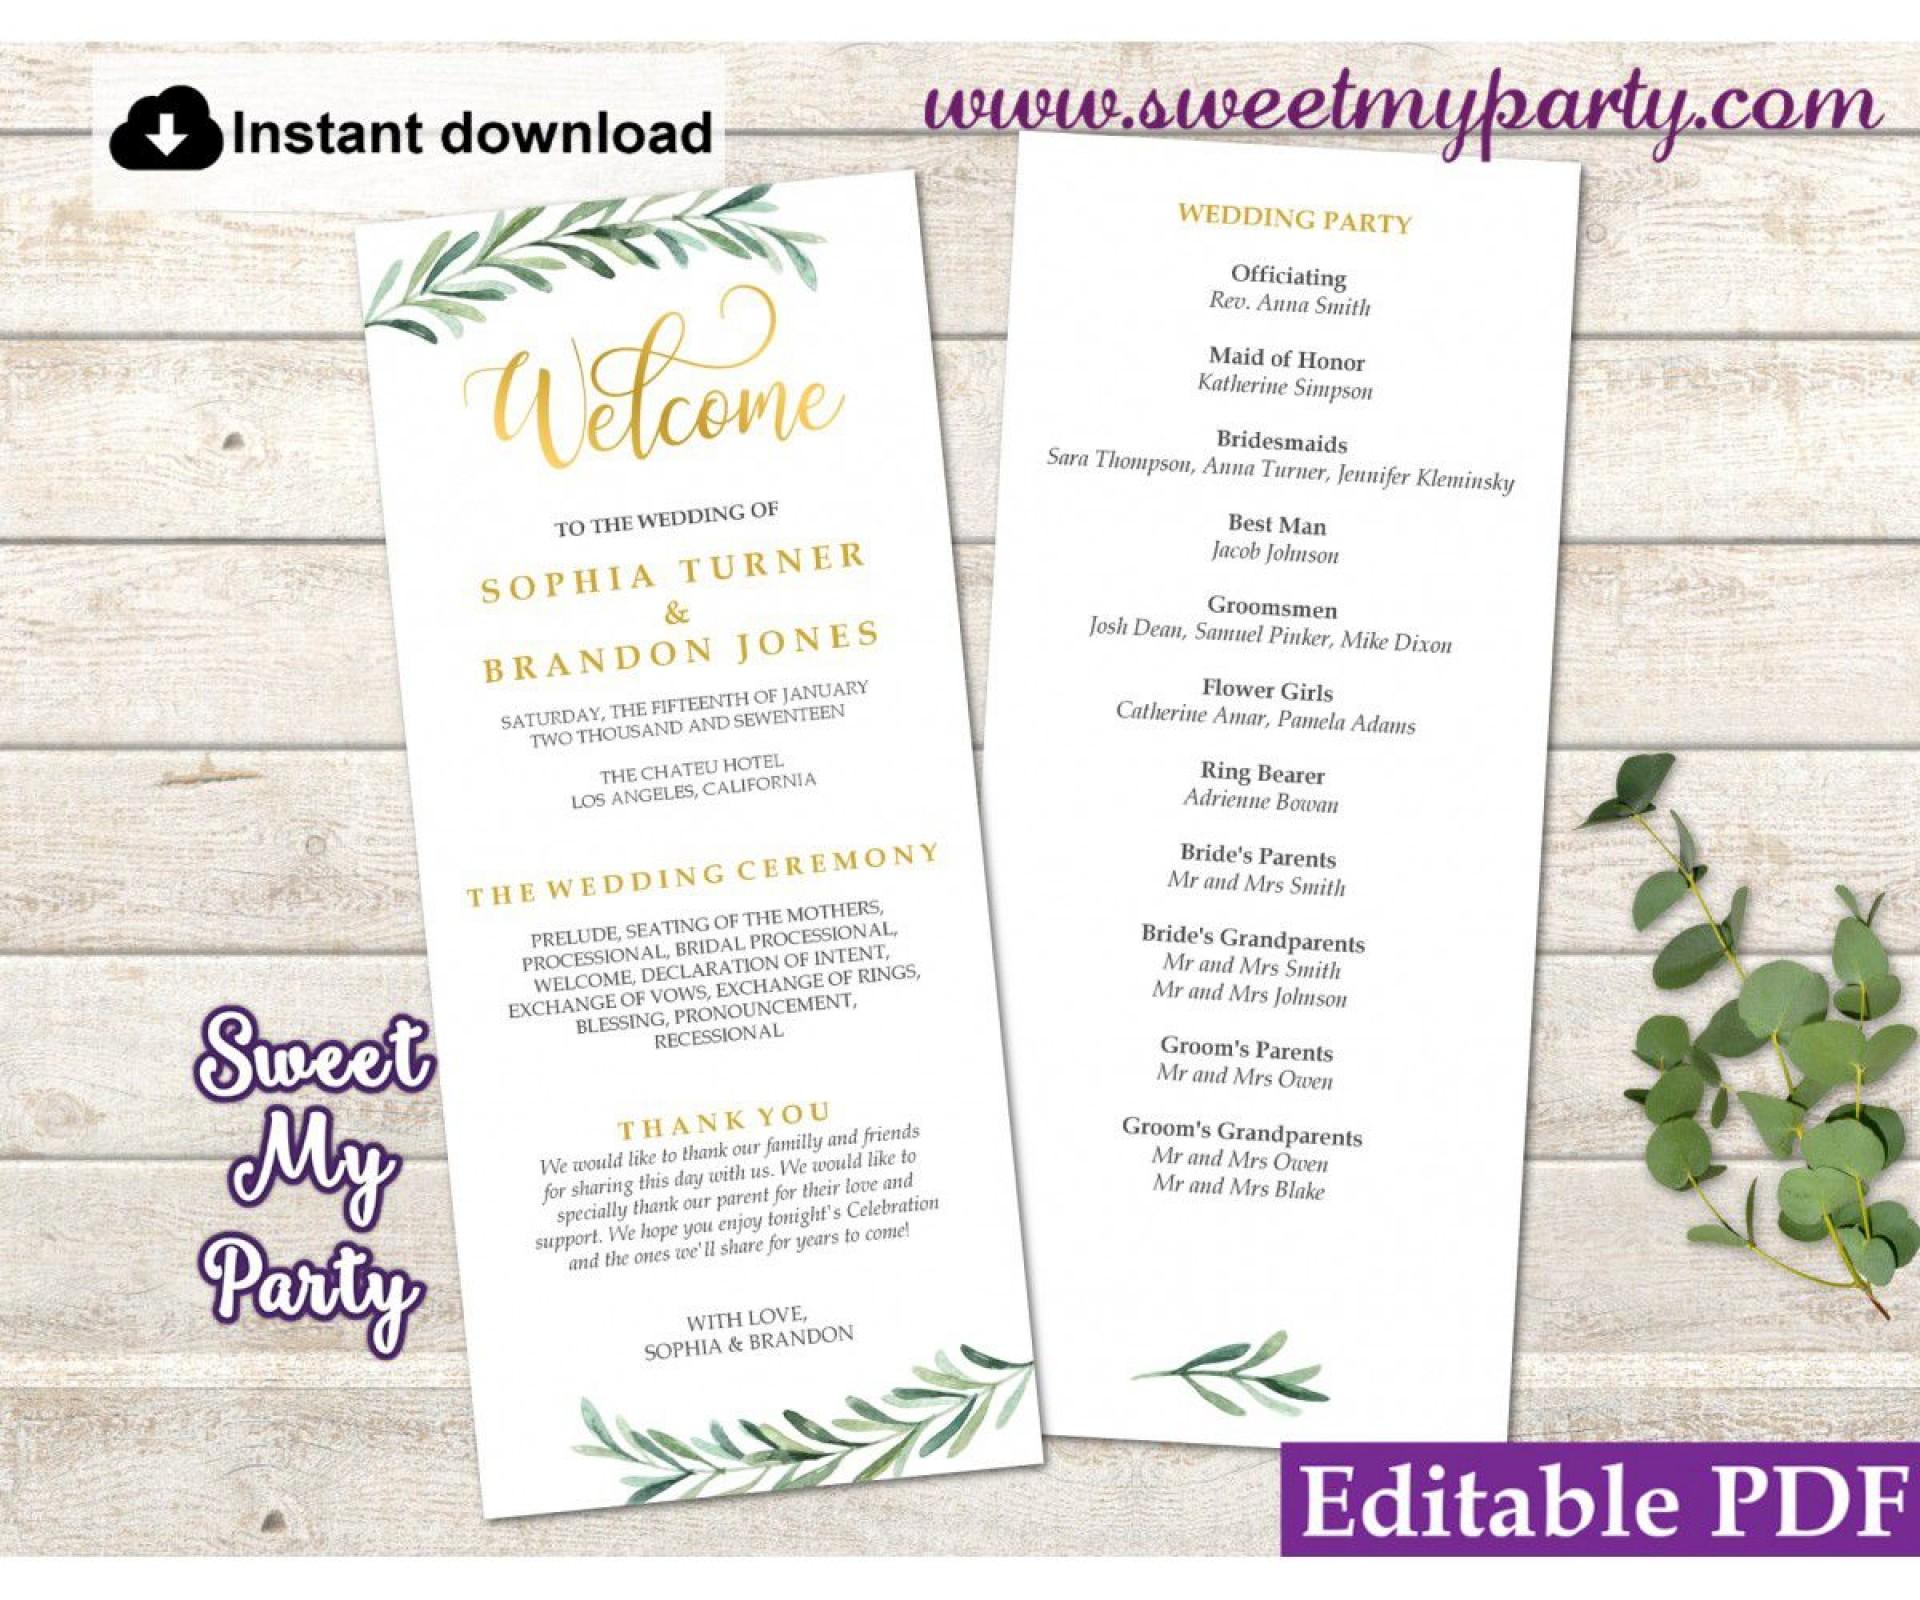 004 Breathtaking Wedding Order Of Service Template Design  Church Free Microsoft Word Download1920